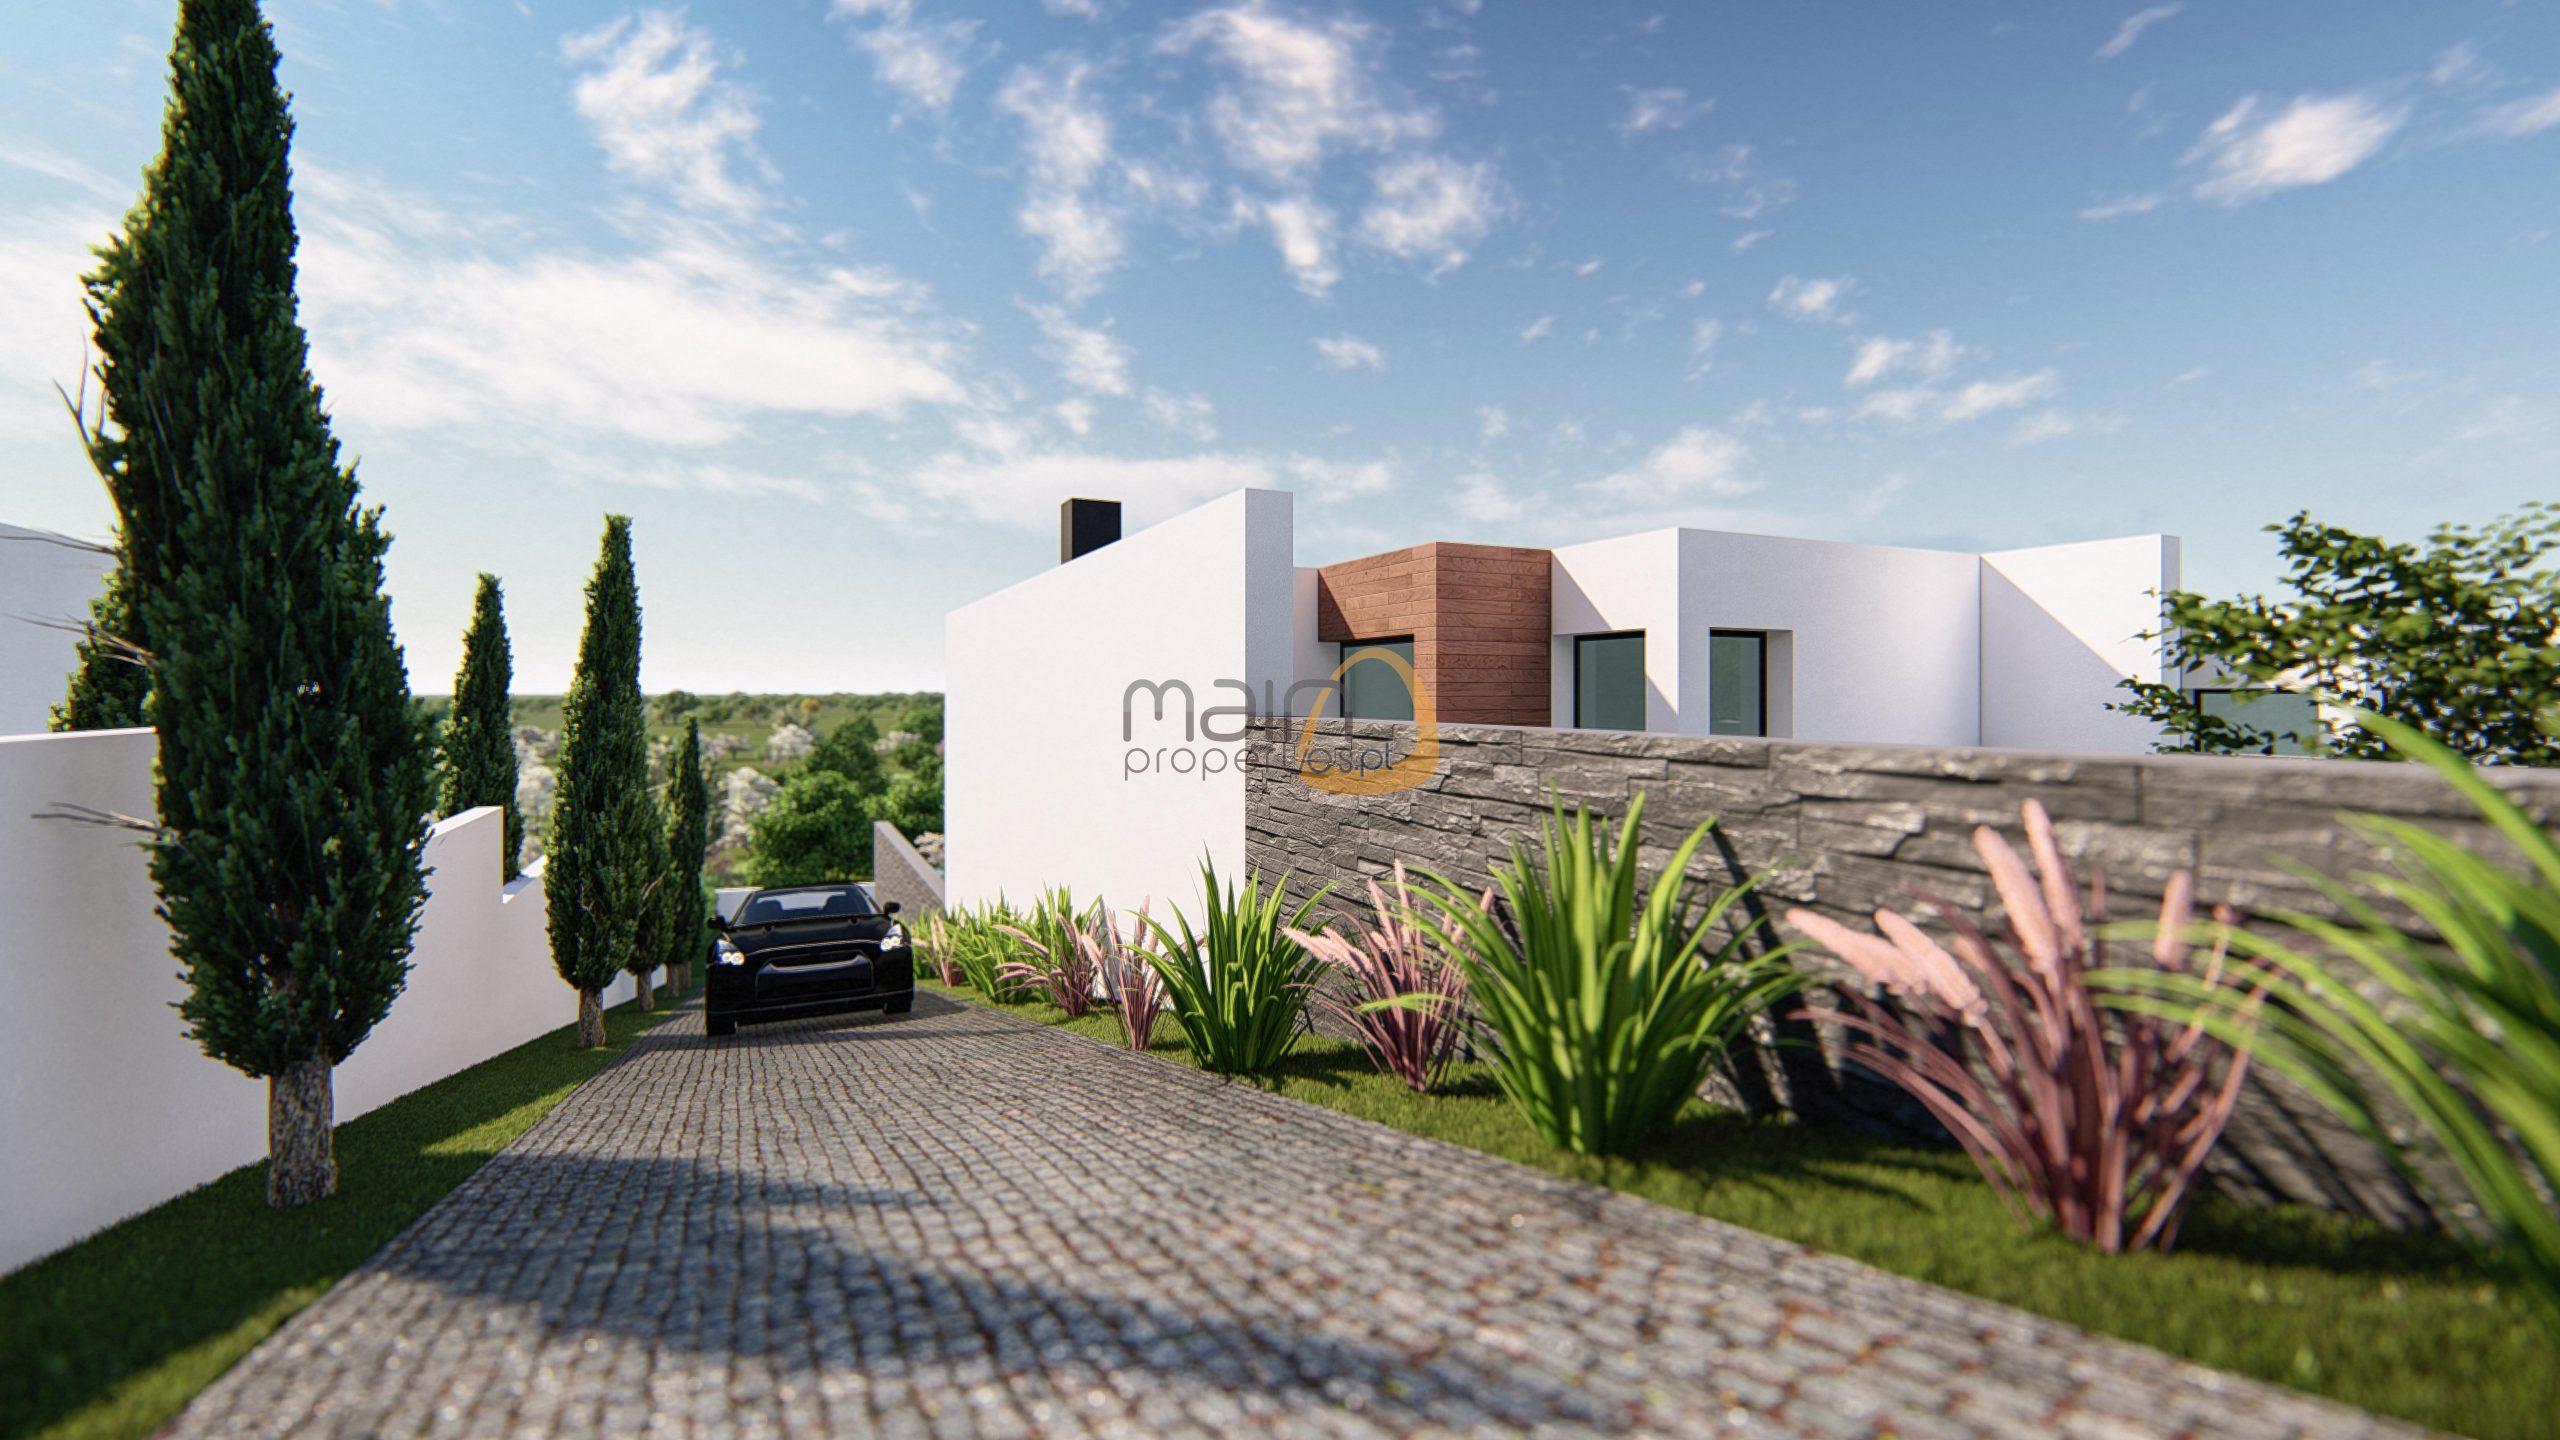 land-for-development-of-eleven-villas-with-sea-views-in-almancil-algarve-portugal-property-real-estate-04